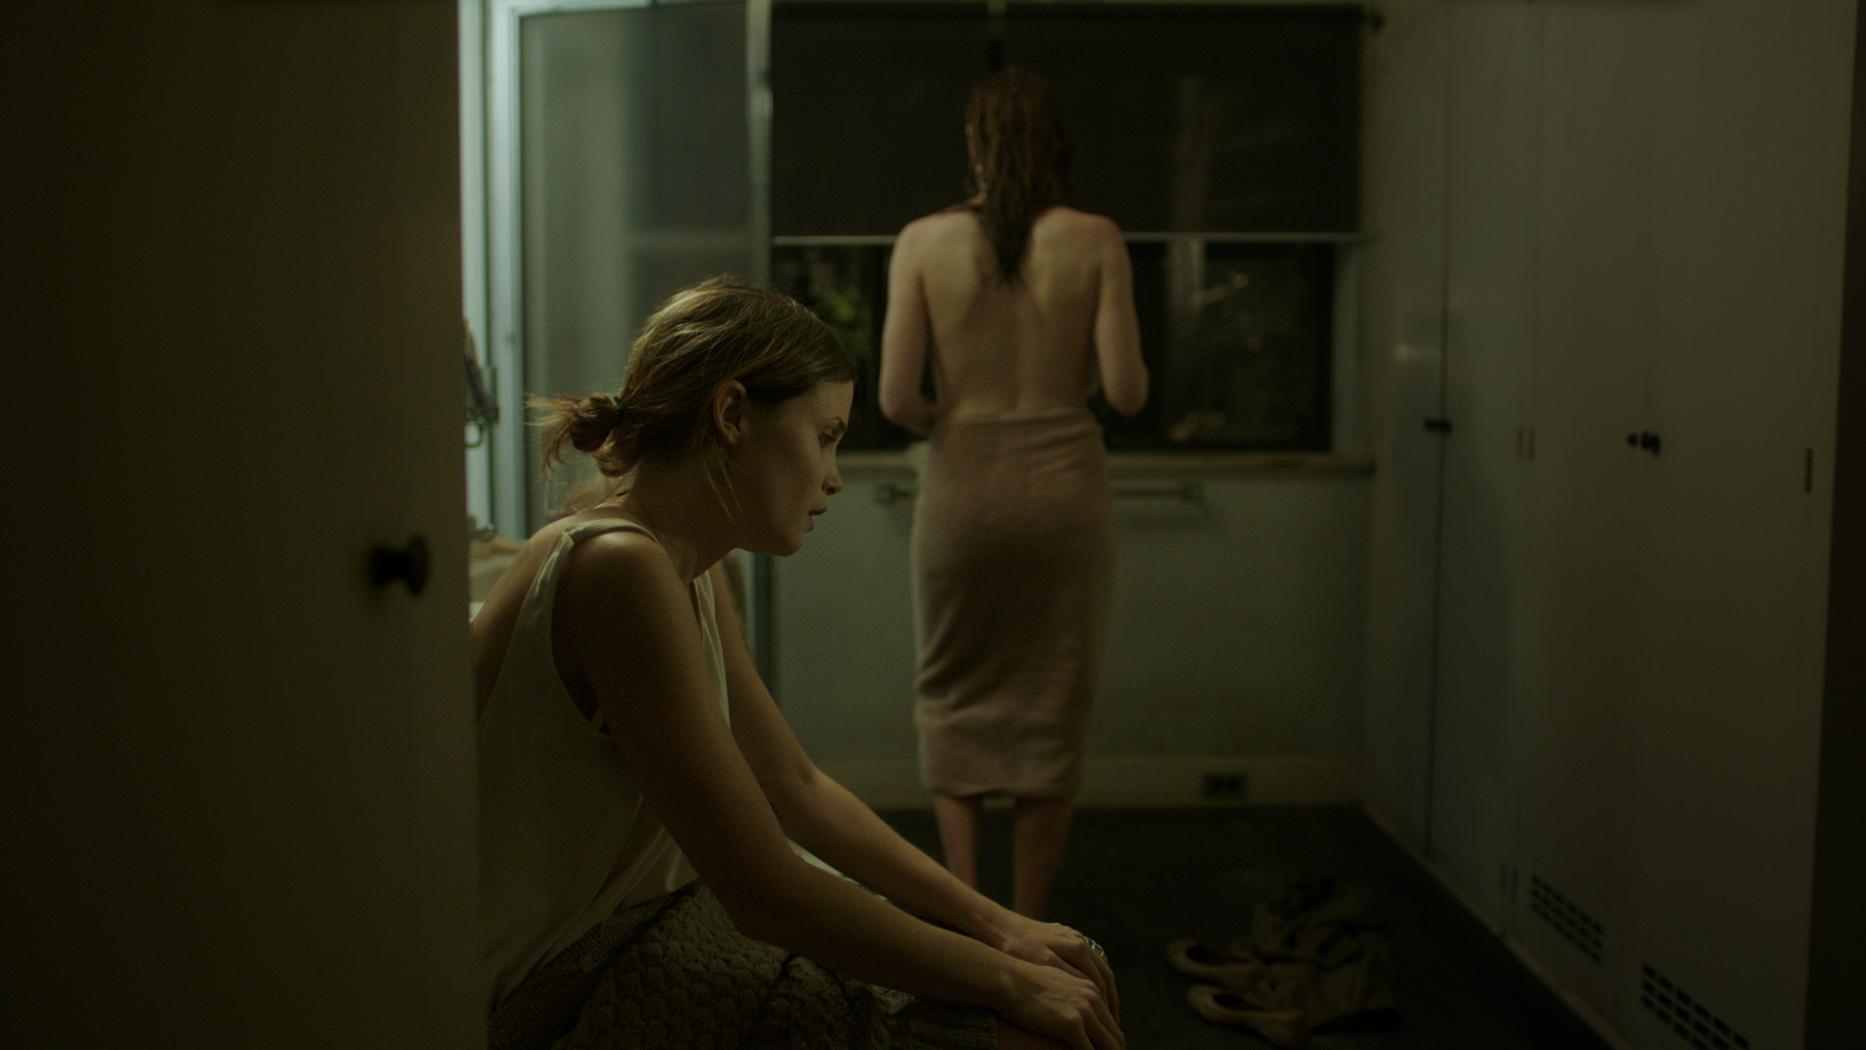 Gitte Witt and Stephanie Ellis in The Sleepwalker (2014)